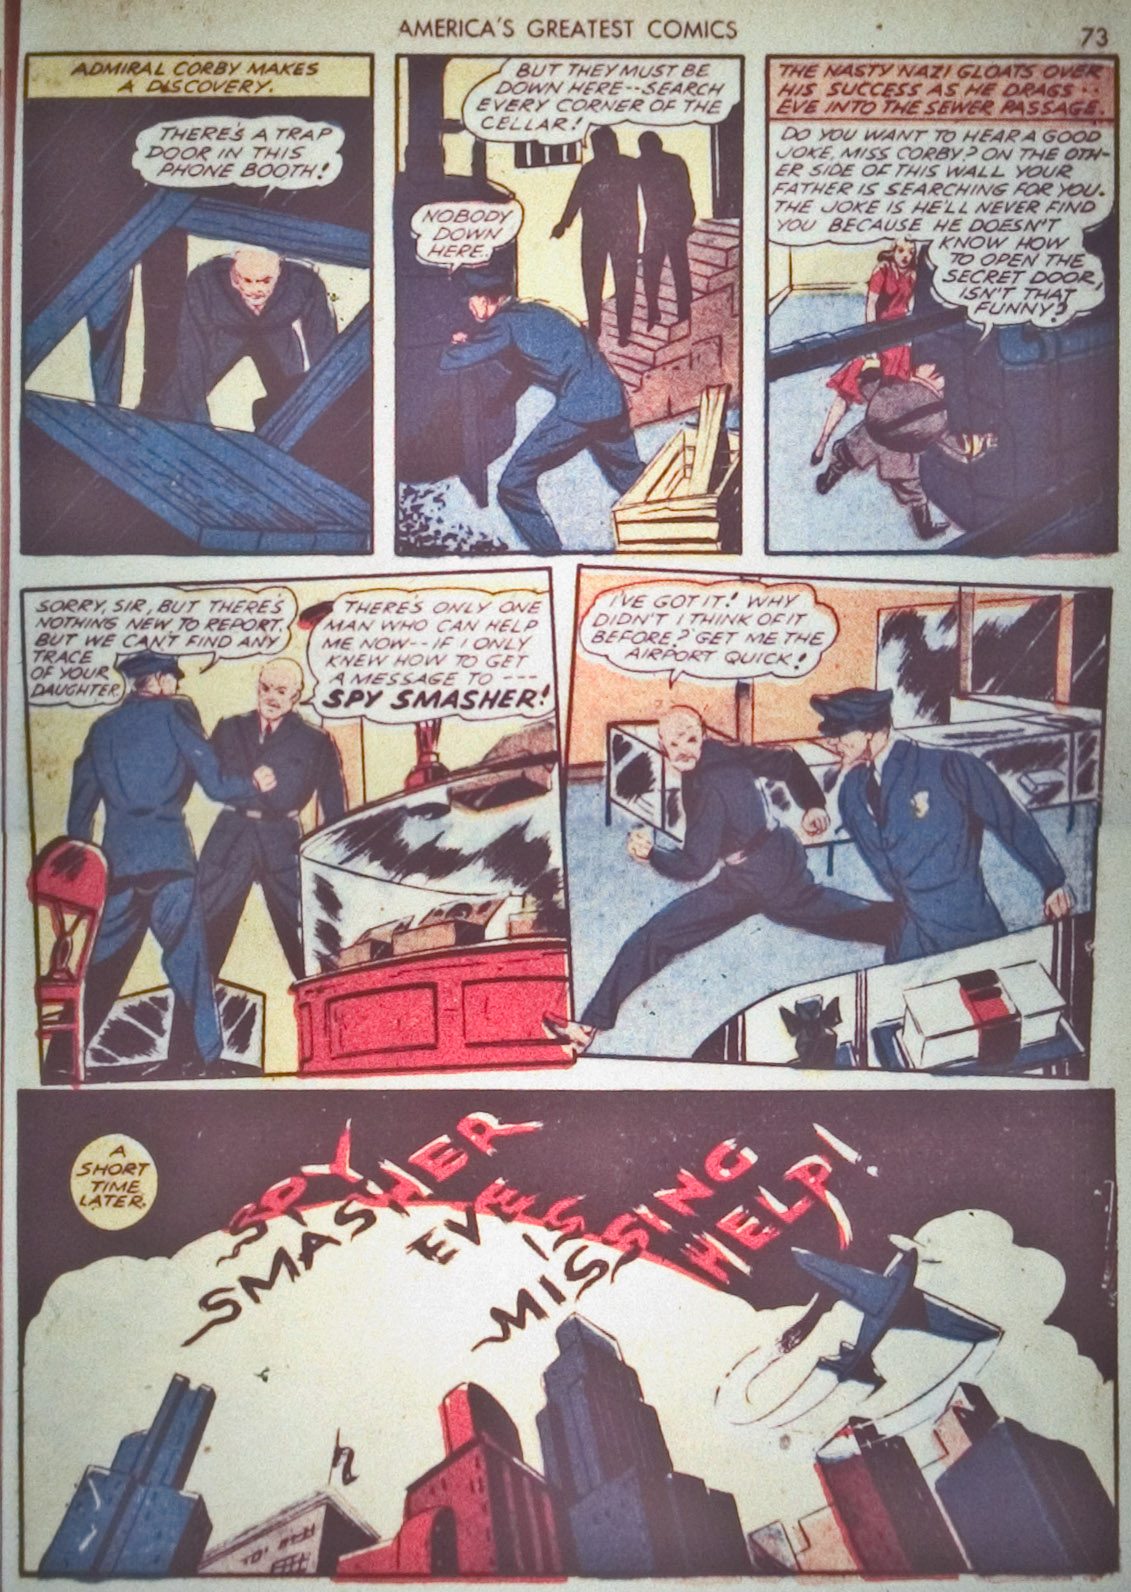 Read online America's Greatest Comics comic -  Issue #1 - 76